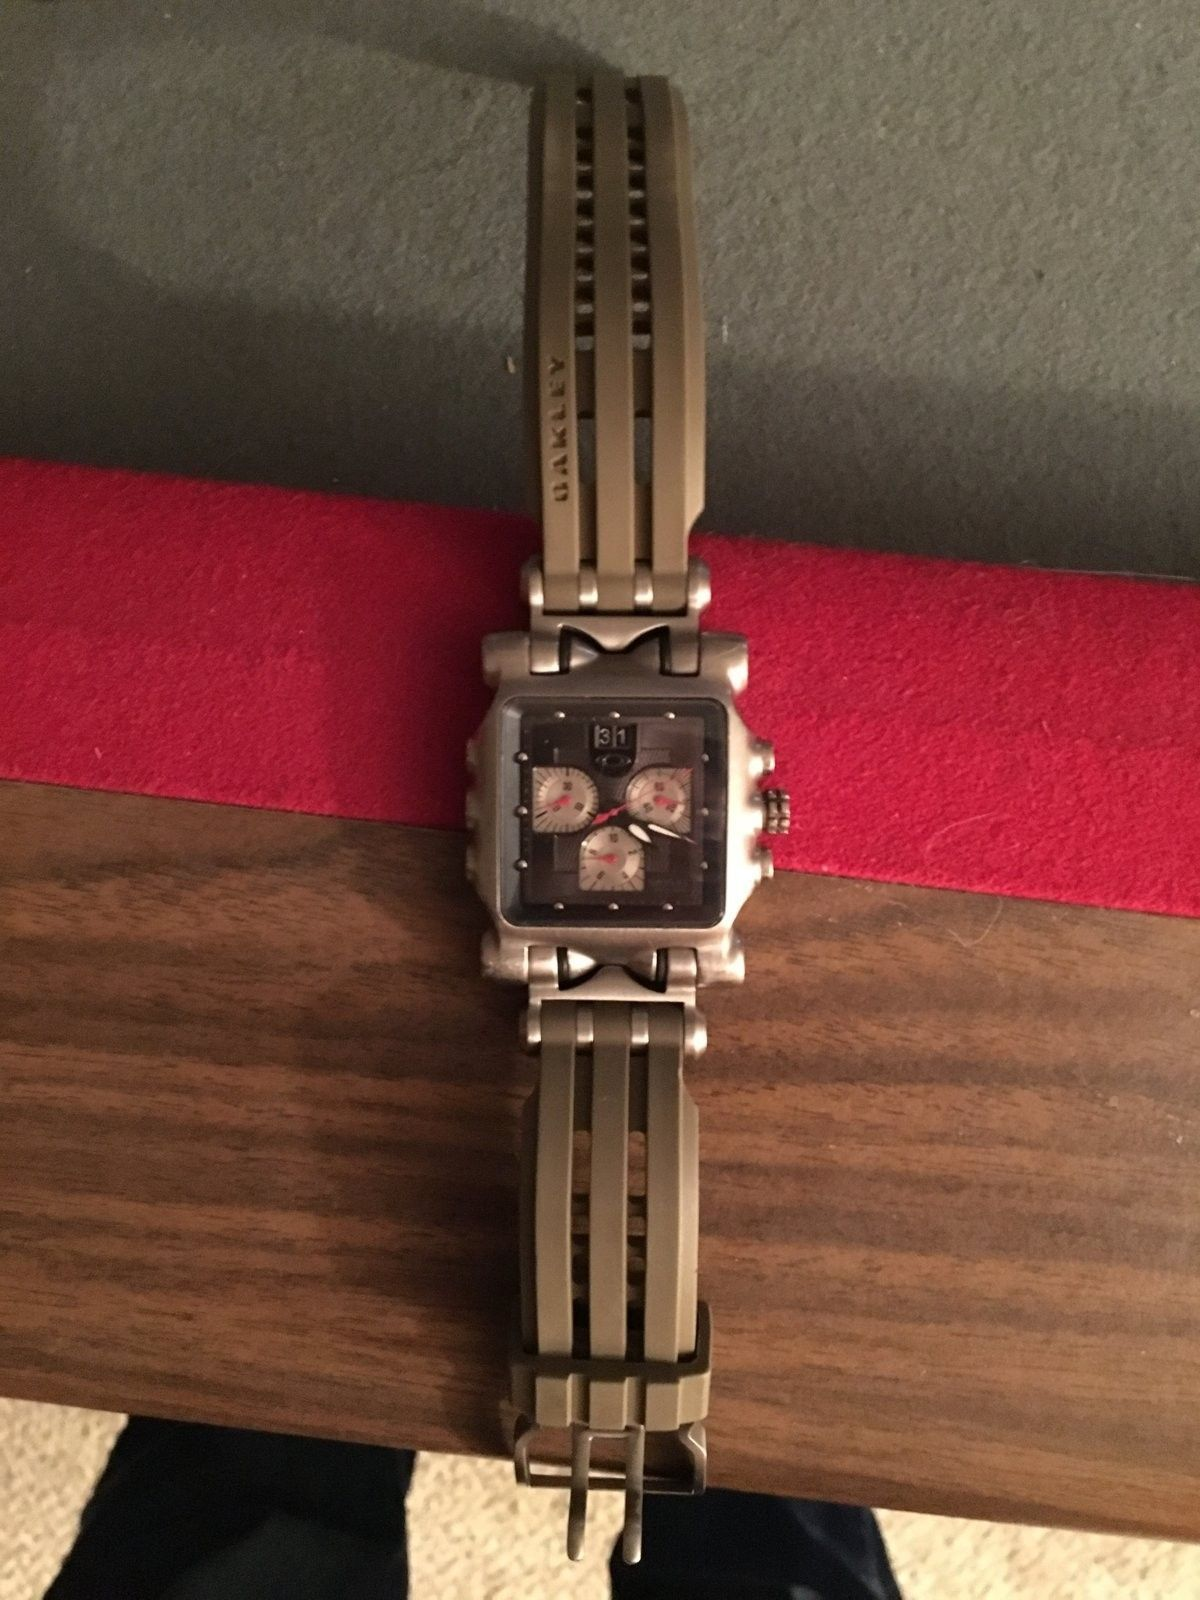 Cool custom watch - image.jpeg